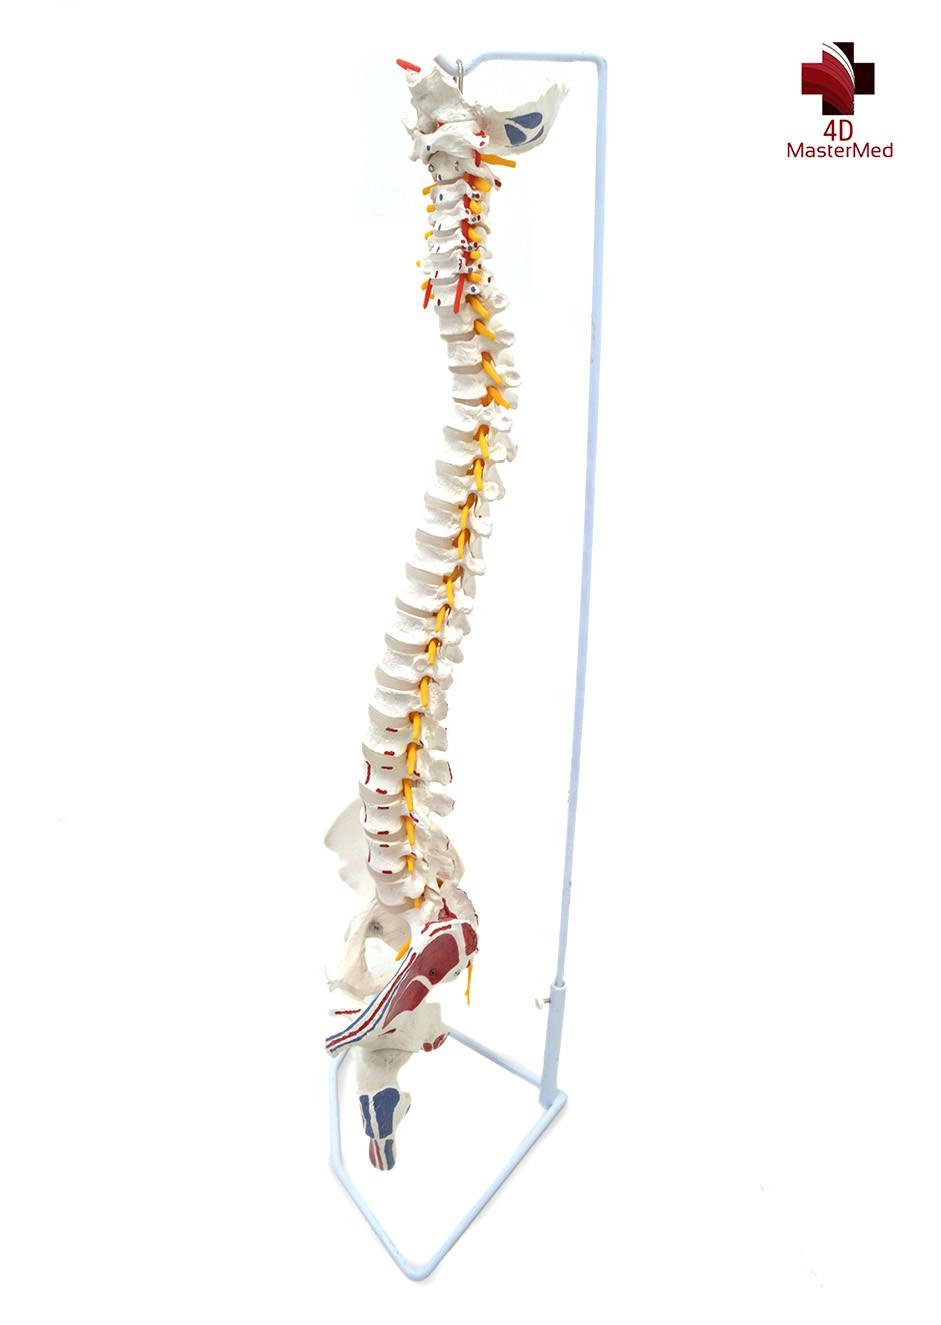 Anatomia da Coluna Vertebral